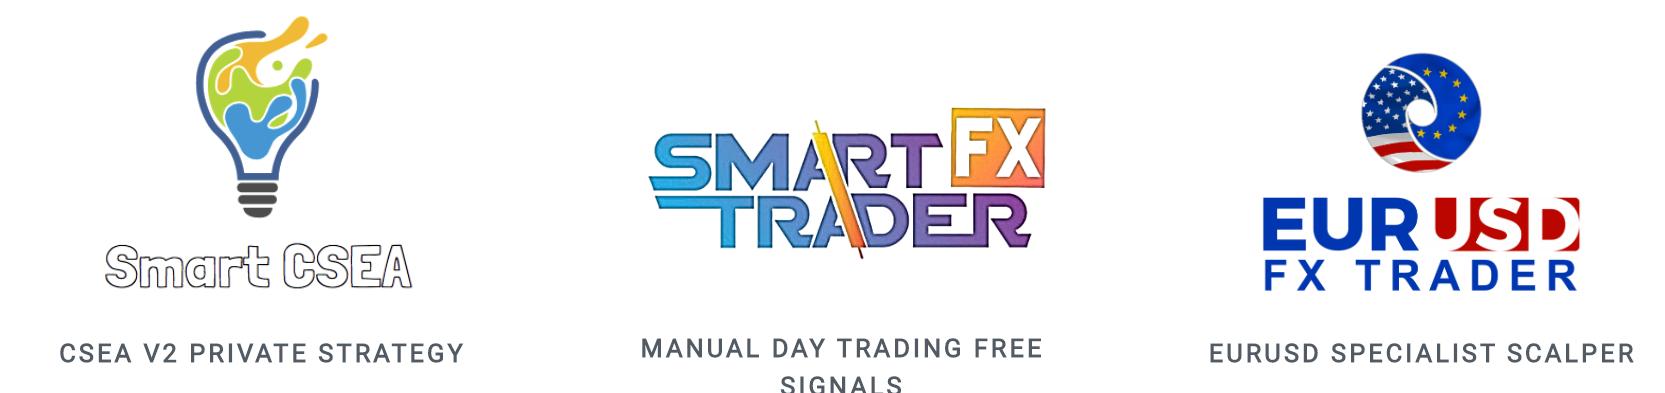 Smart FX Trader strategies